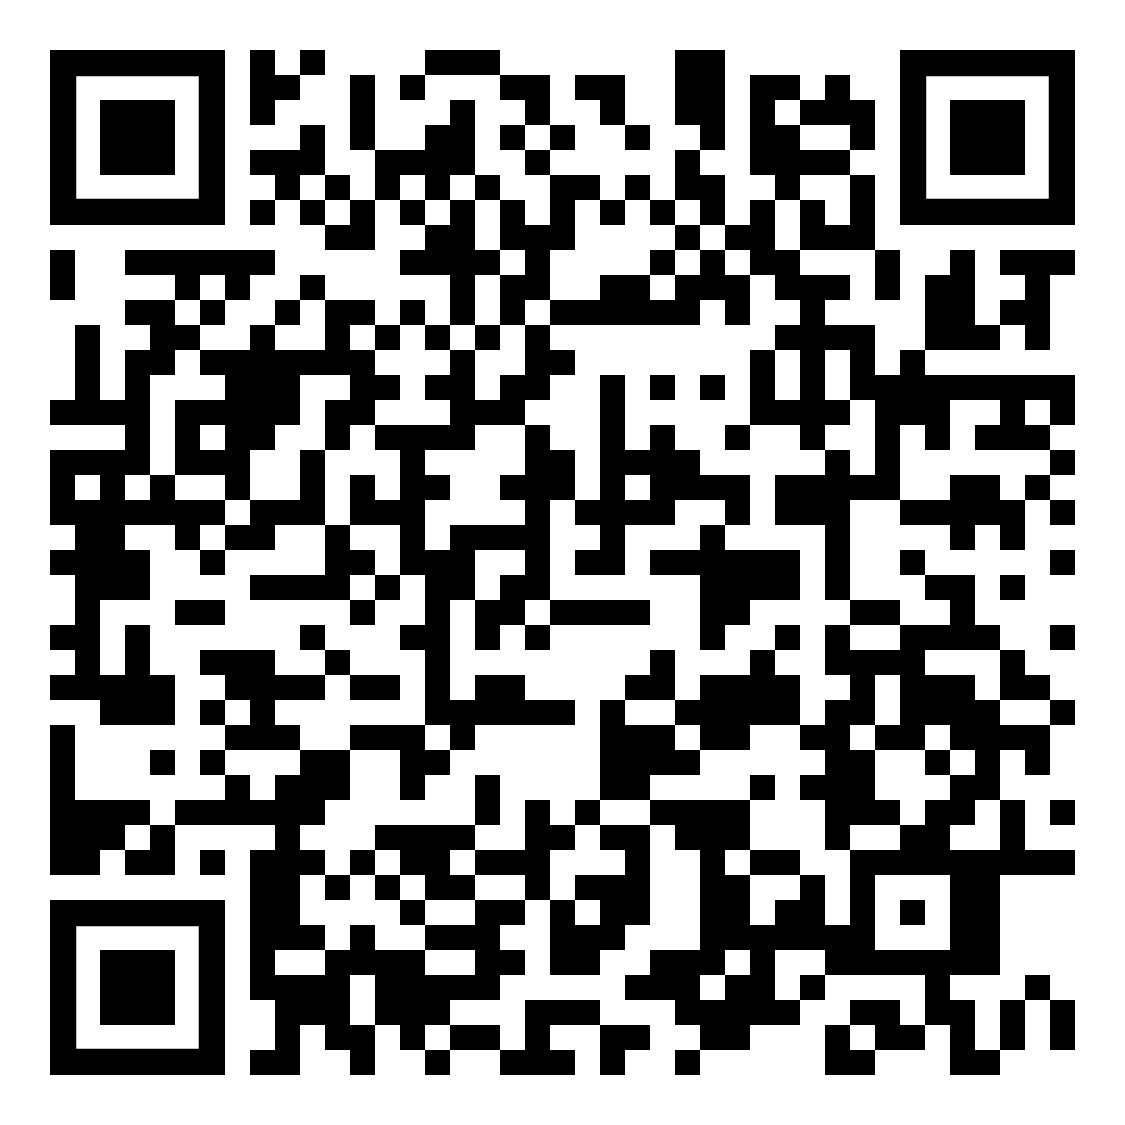 Eurojackpot Android app